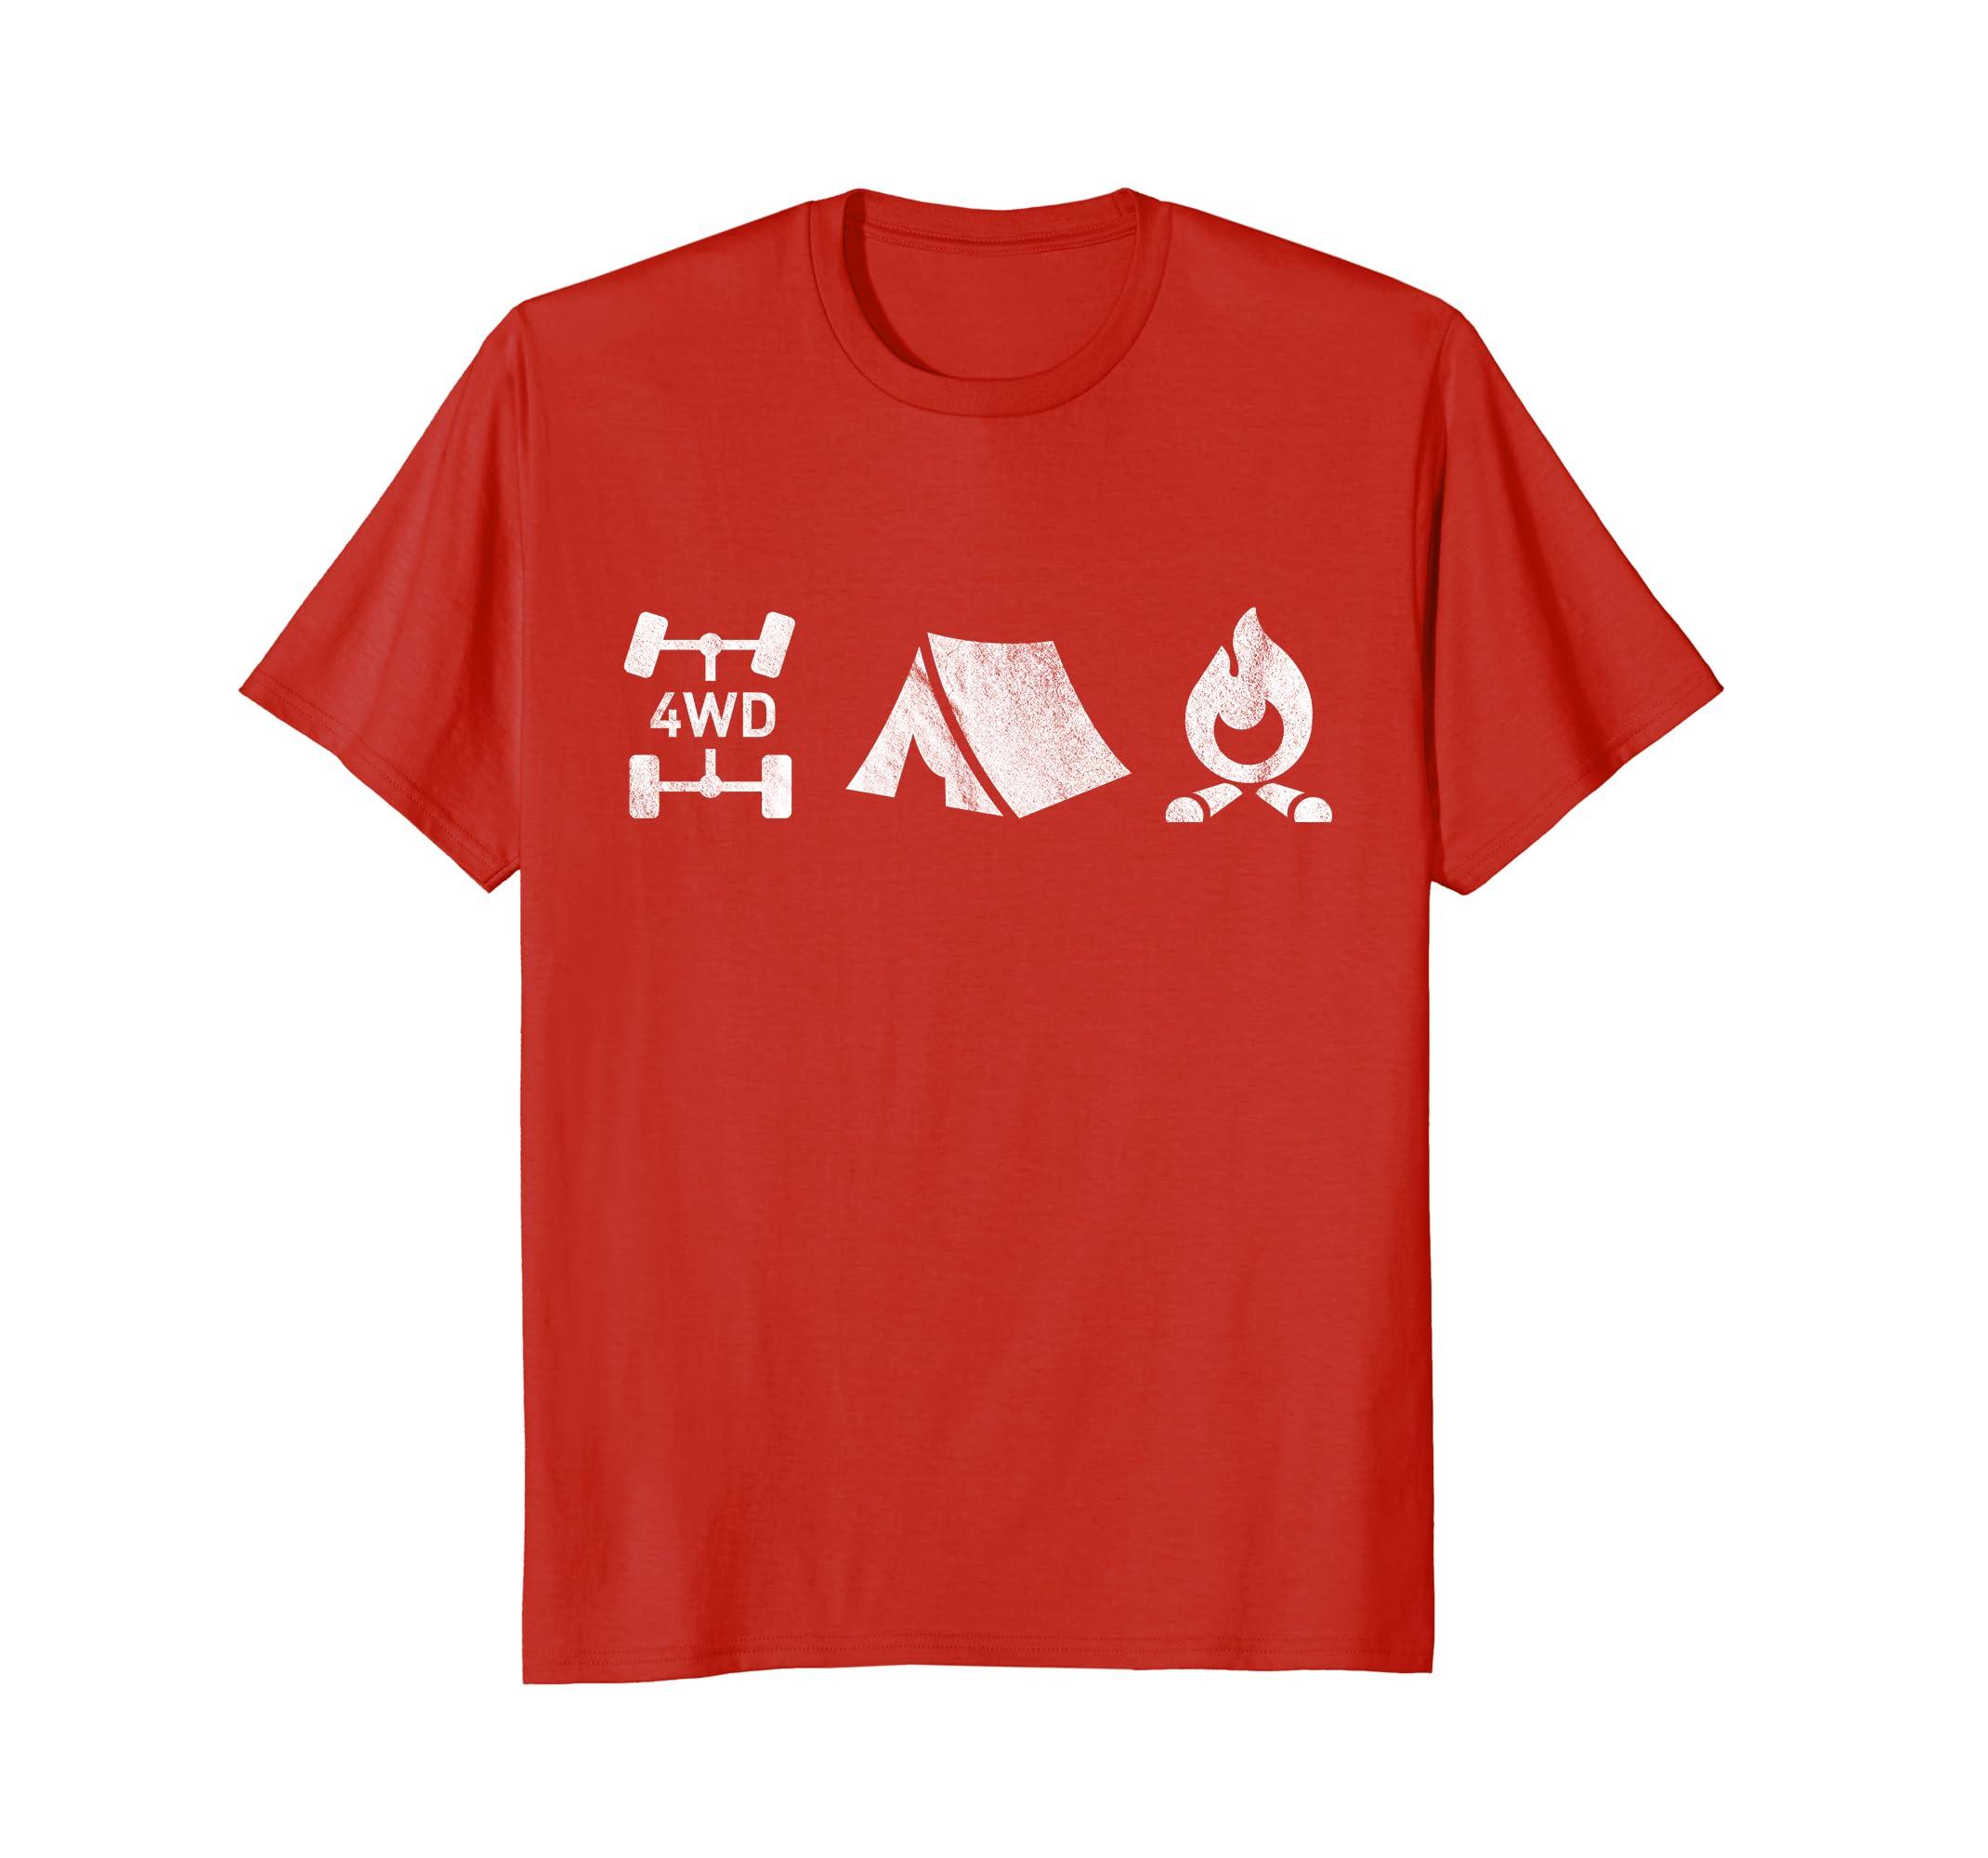 4WD Overland Explorer Tee 4x4 Tent Camp Fire T-Shirt-alottee gift